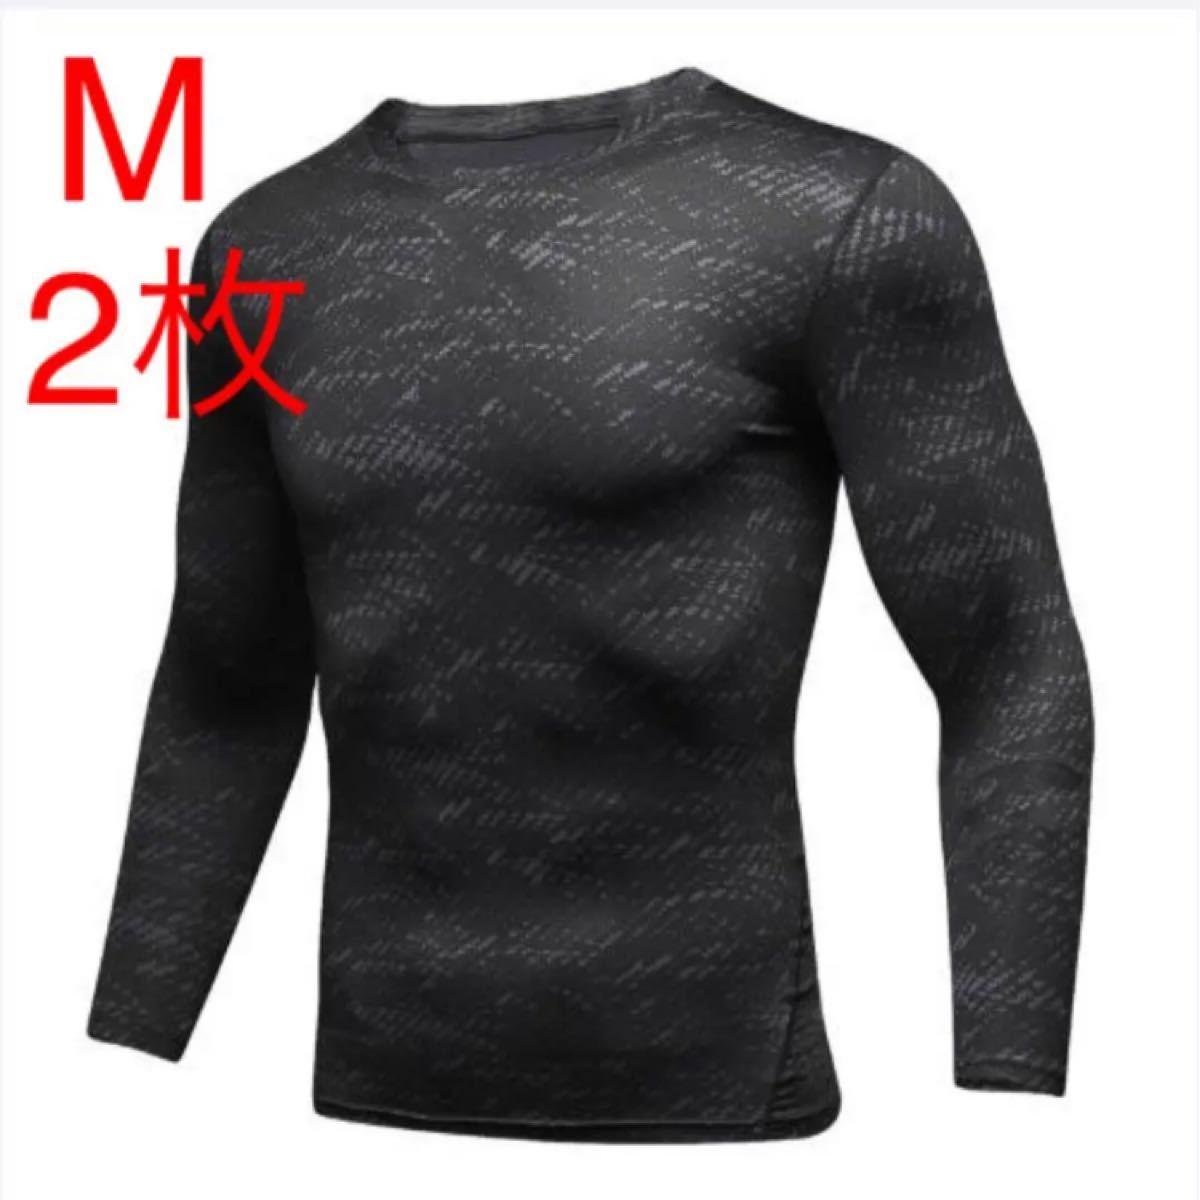 【Mサイズ 2枚】 コンプレッションウェア 加圧 インナー メンズ 長袖 柄